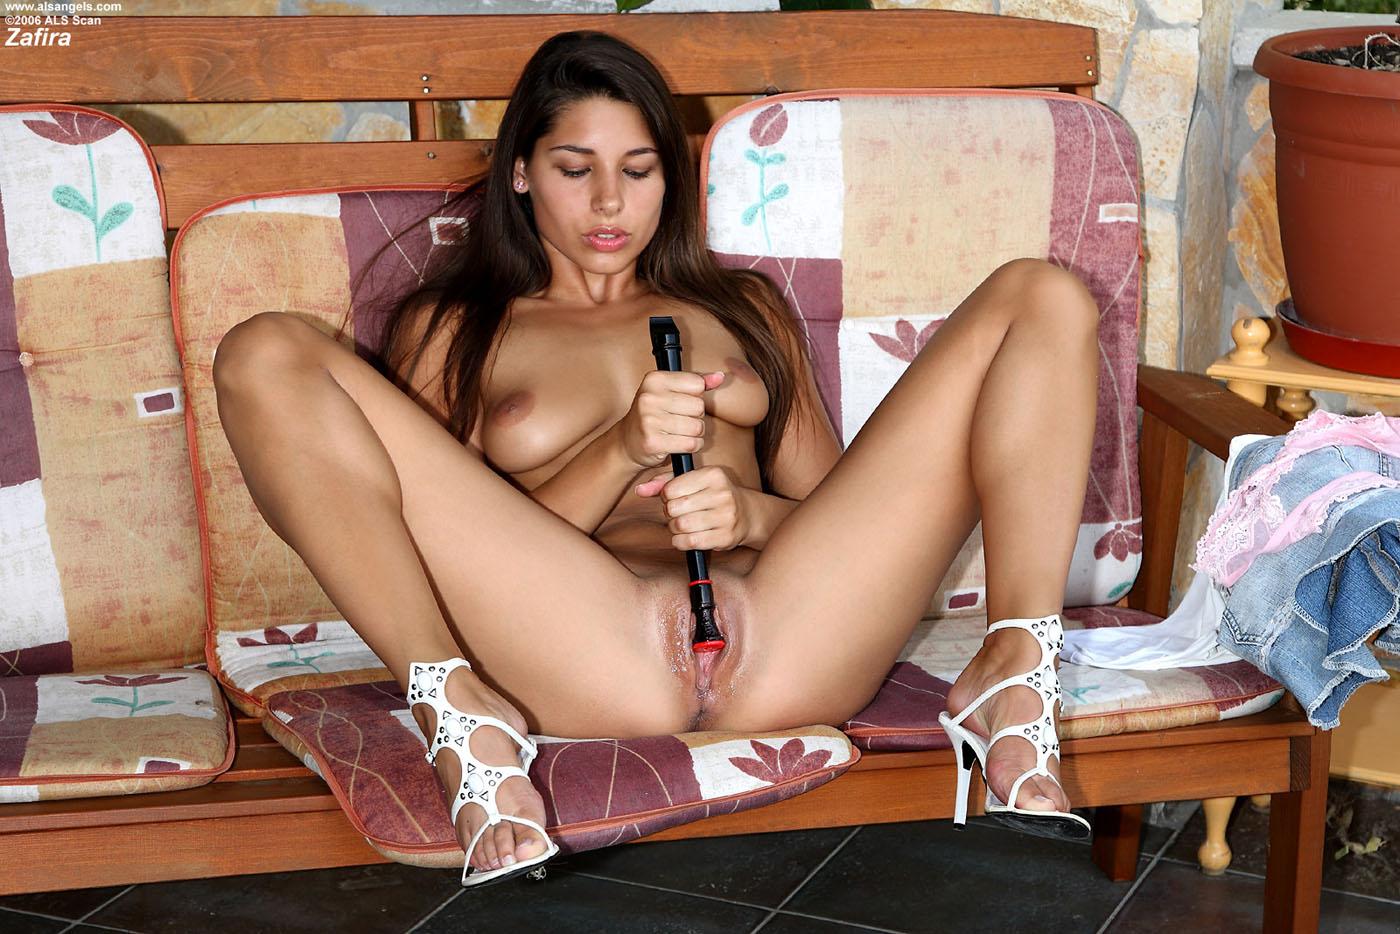 Фото порно актрисы zafira, Порно актриса Zafira (Зафира) - биография модели 18 фотография